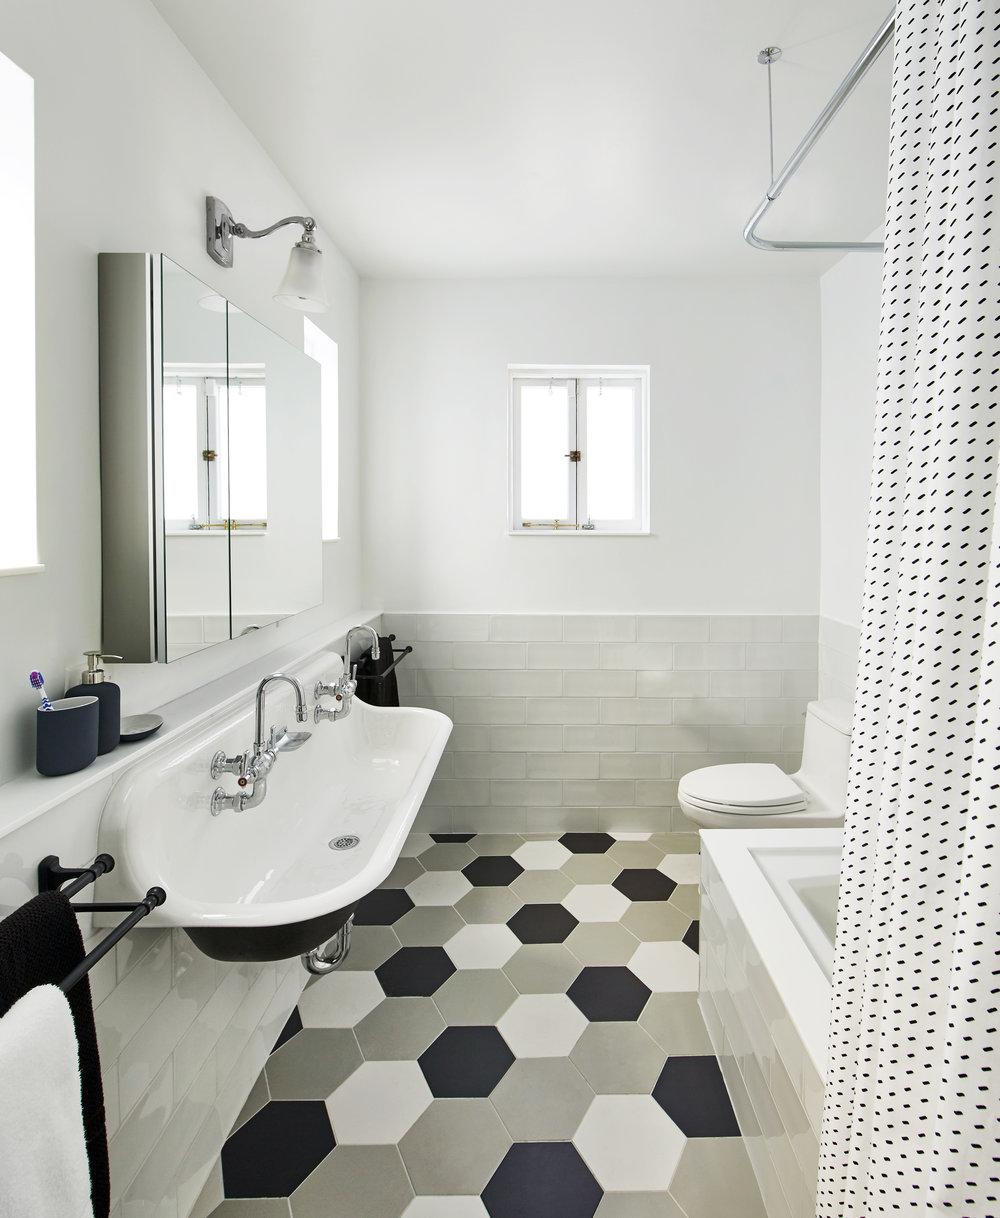 Neutral-Tones-Concrete-Tile-Bathroom-JMorris-Design-Interior-Designer-Brooklyn-New-York-Online.jpg